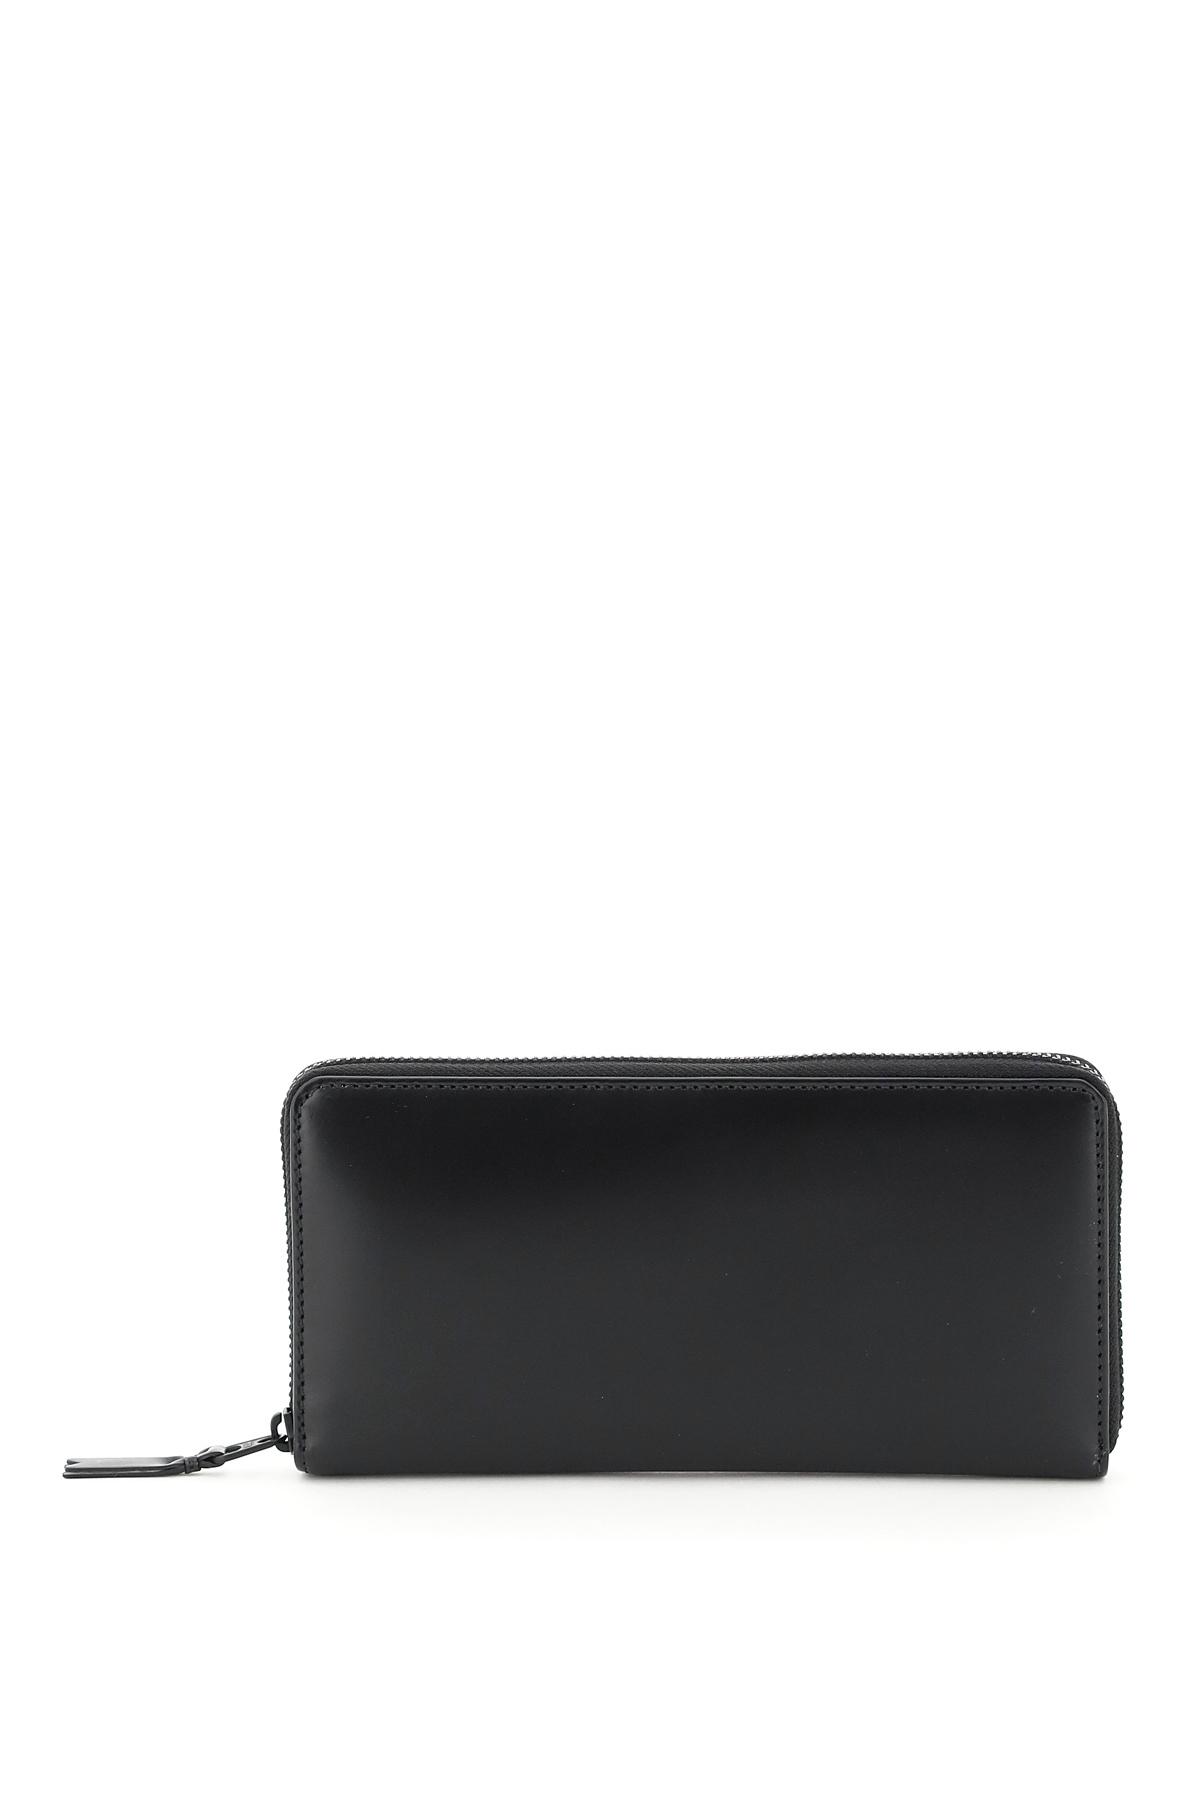 Comme des garcons wallet portafoglio zip around very black